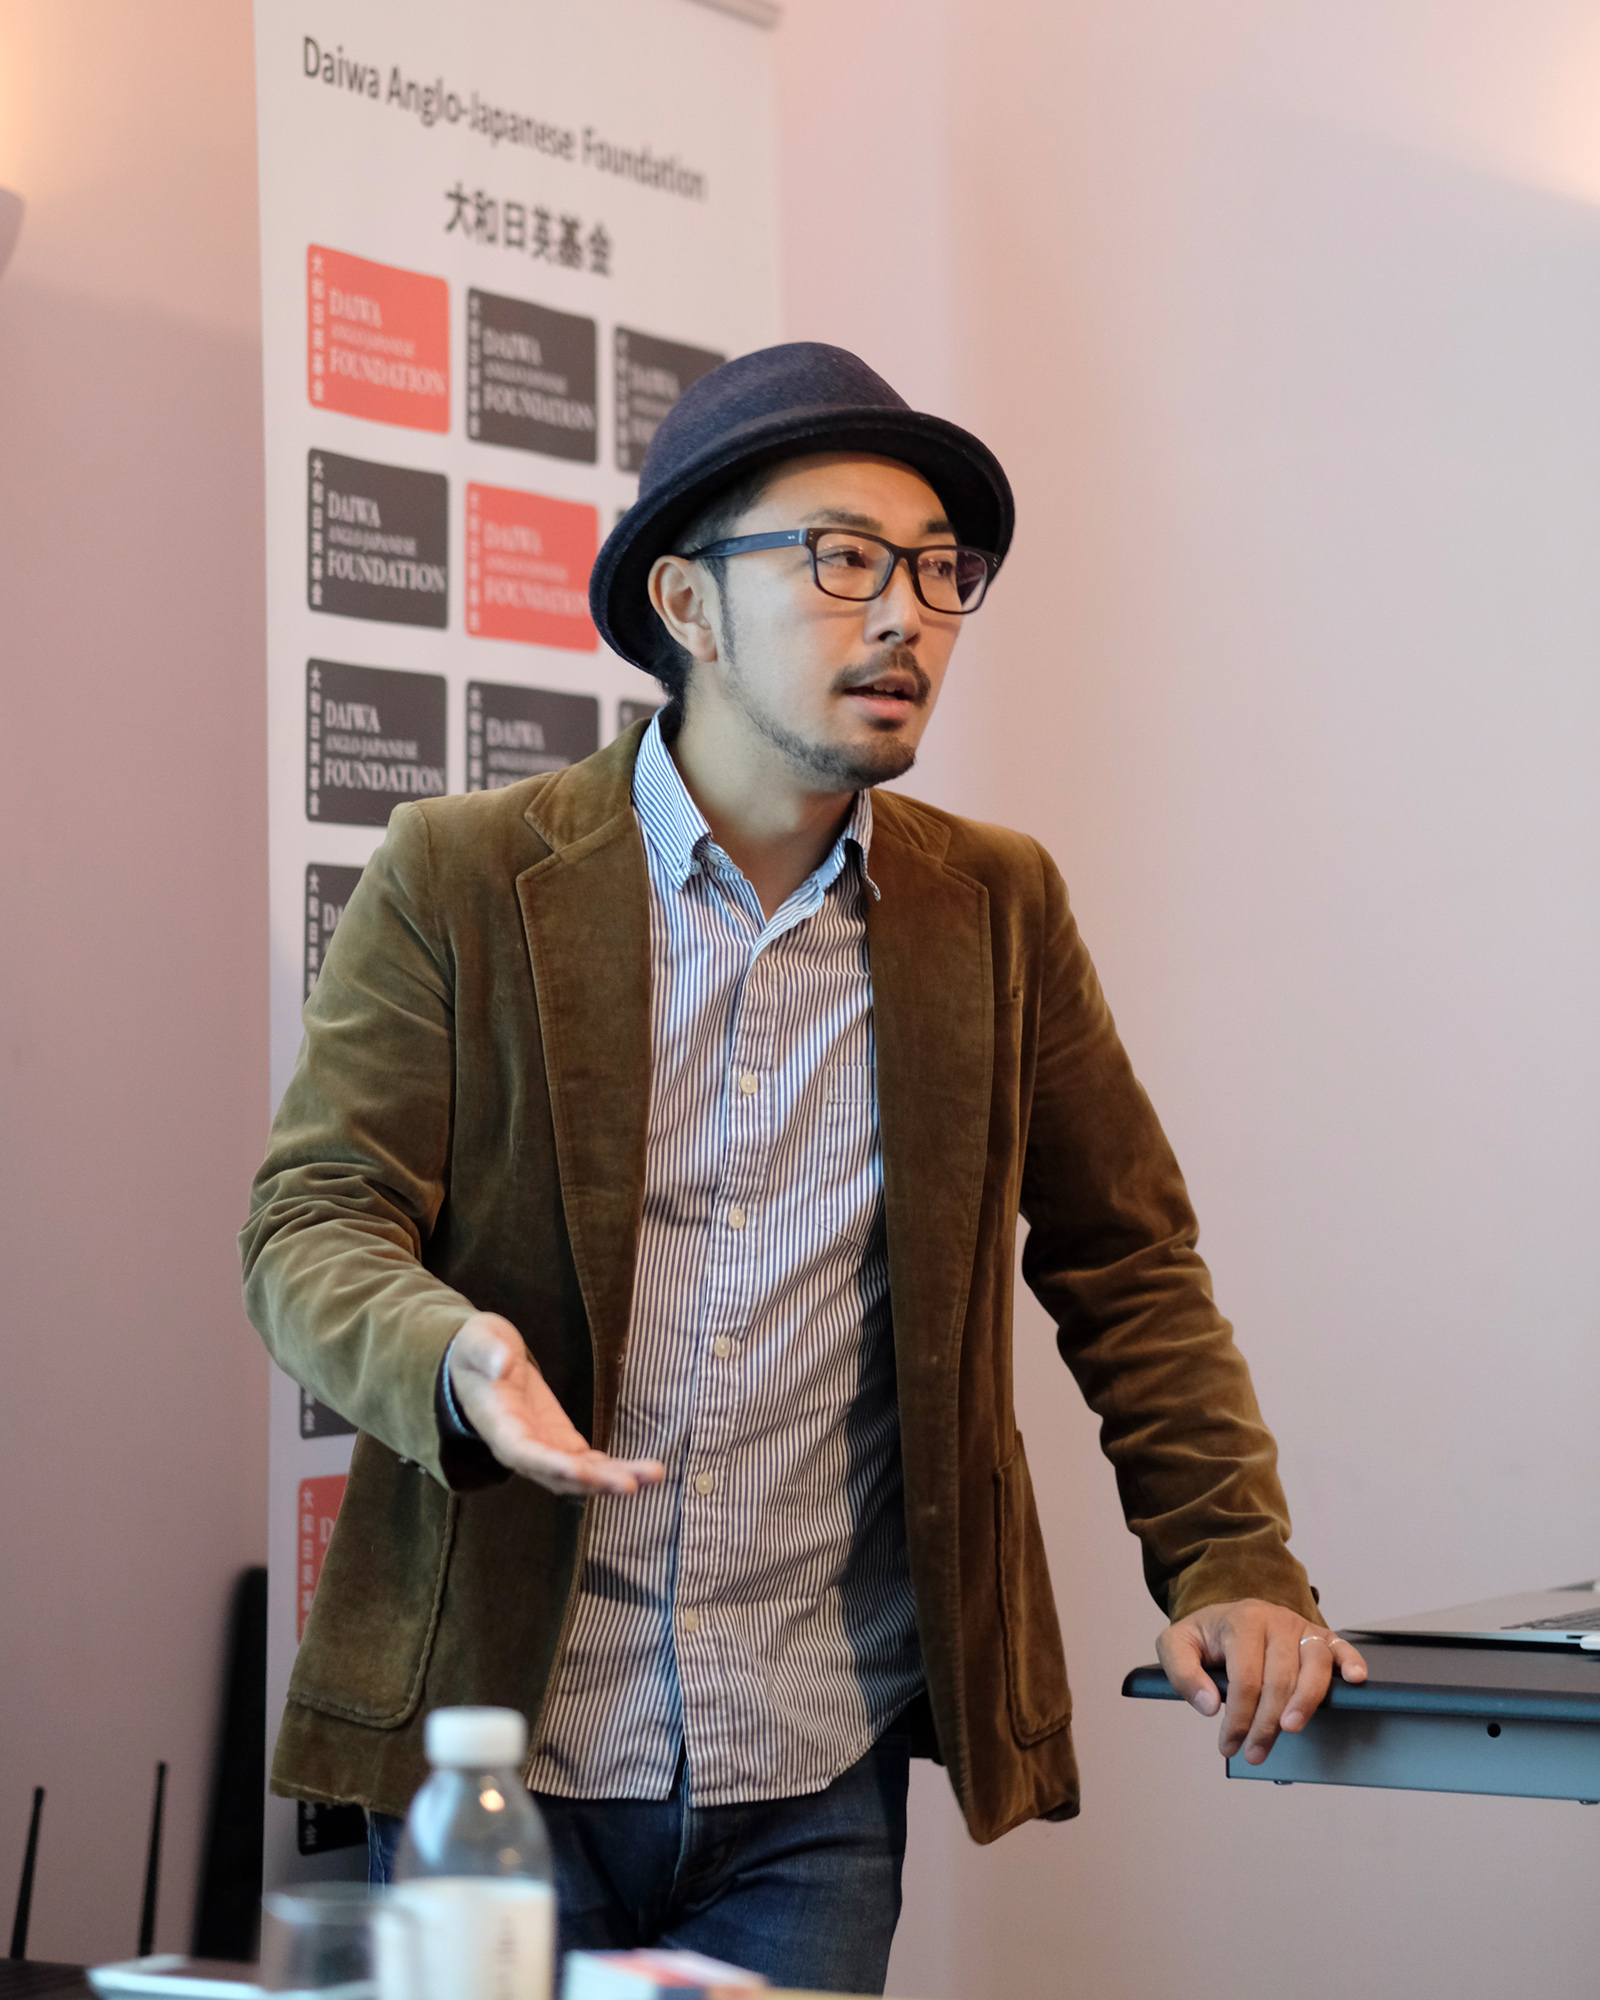 Kazuma Obara giving a presentation on the 18th October, 2018 . Taken by Graham Land